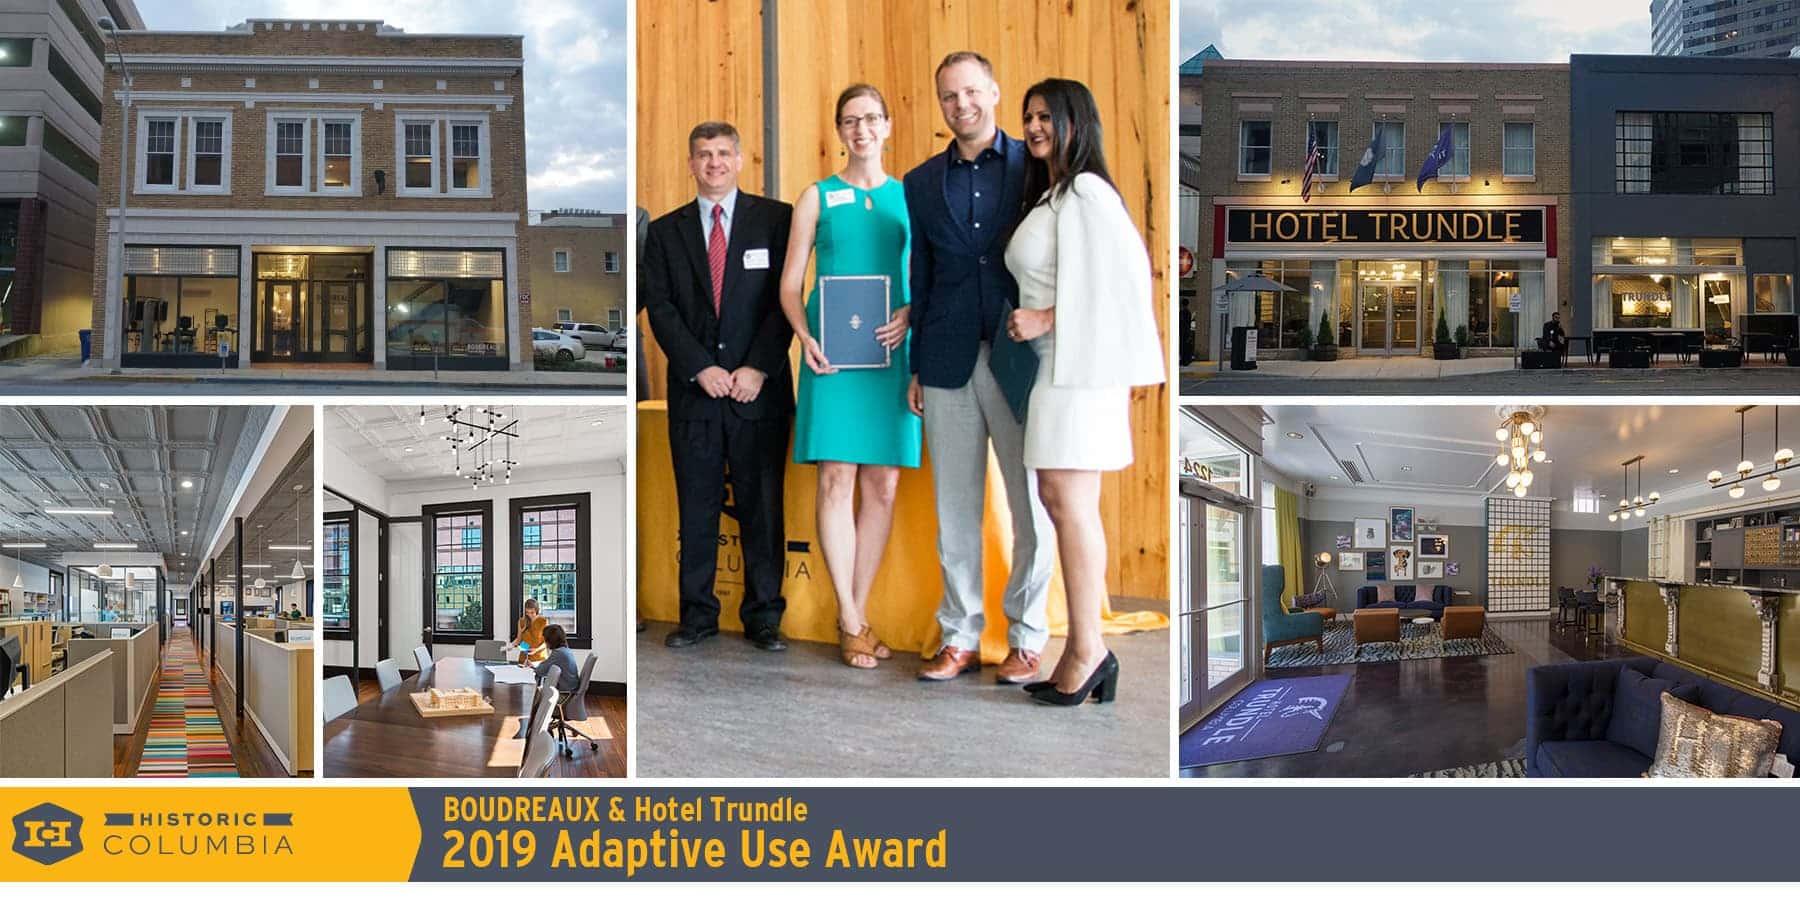 Boudreaux & Hotel Trundle Award